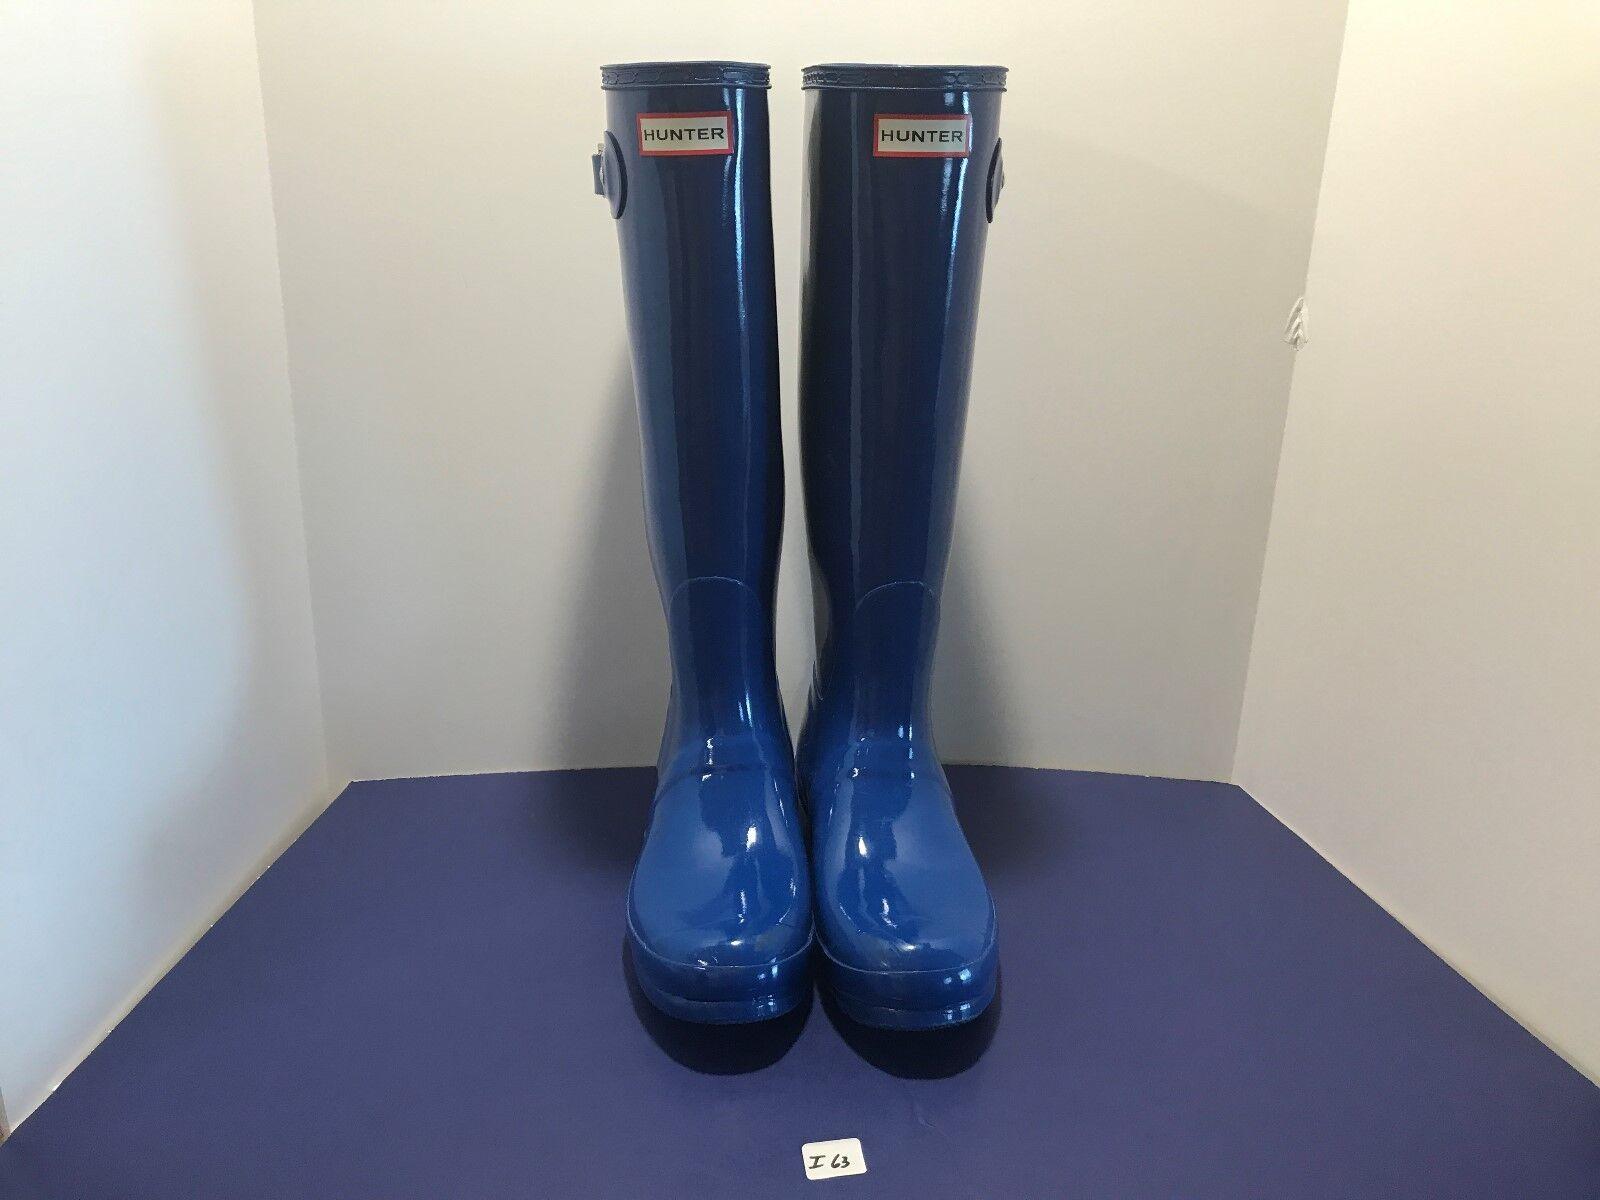 HUNTER Tall Gloss Blu Gomma  Buckle Rain stivali US 8 EU 39 UK 6 I63  grande sconto